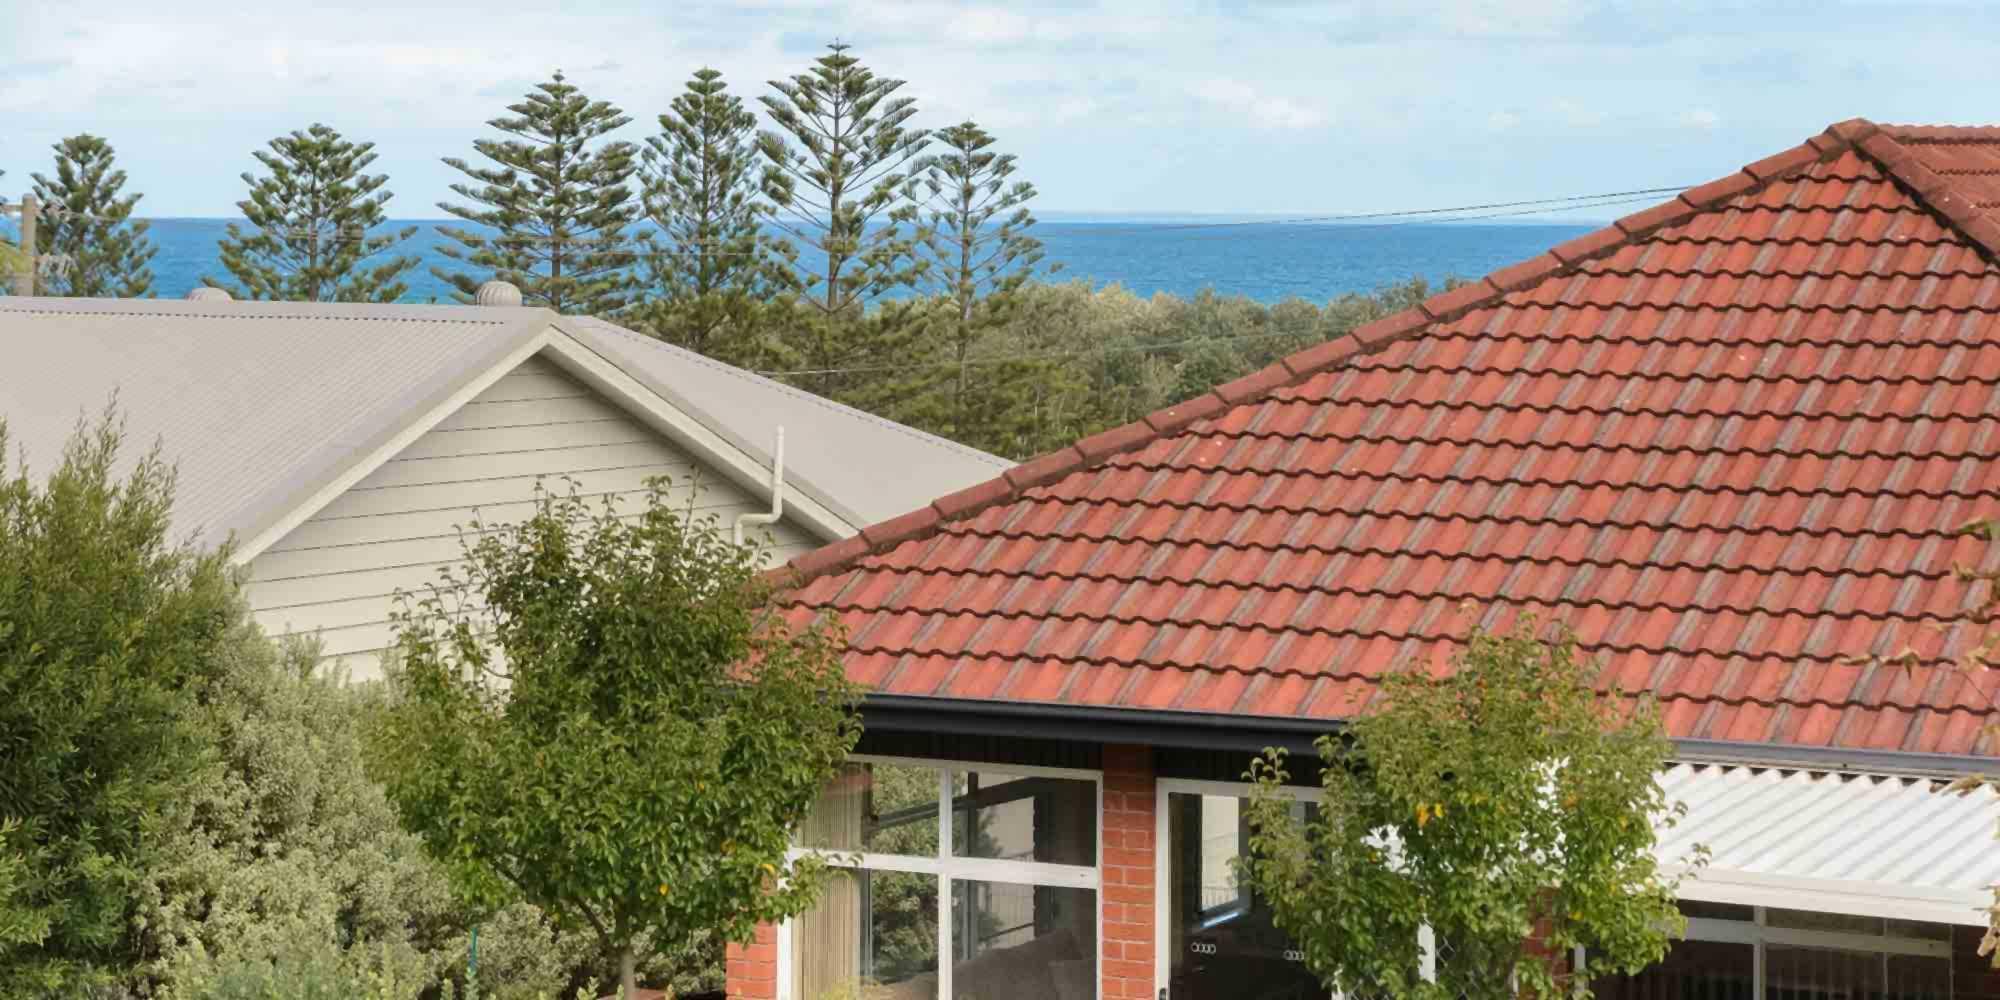 Backyard views at Southerly Change Gerroa accommodation at Seven Mile Beach, NSW